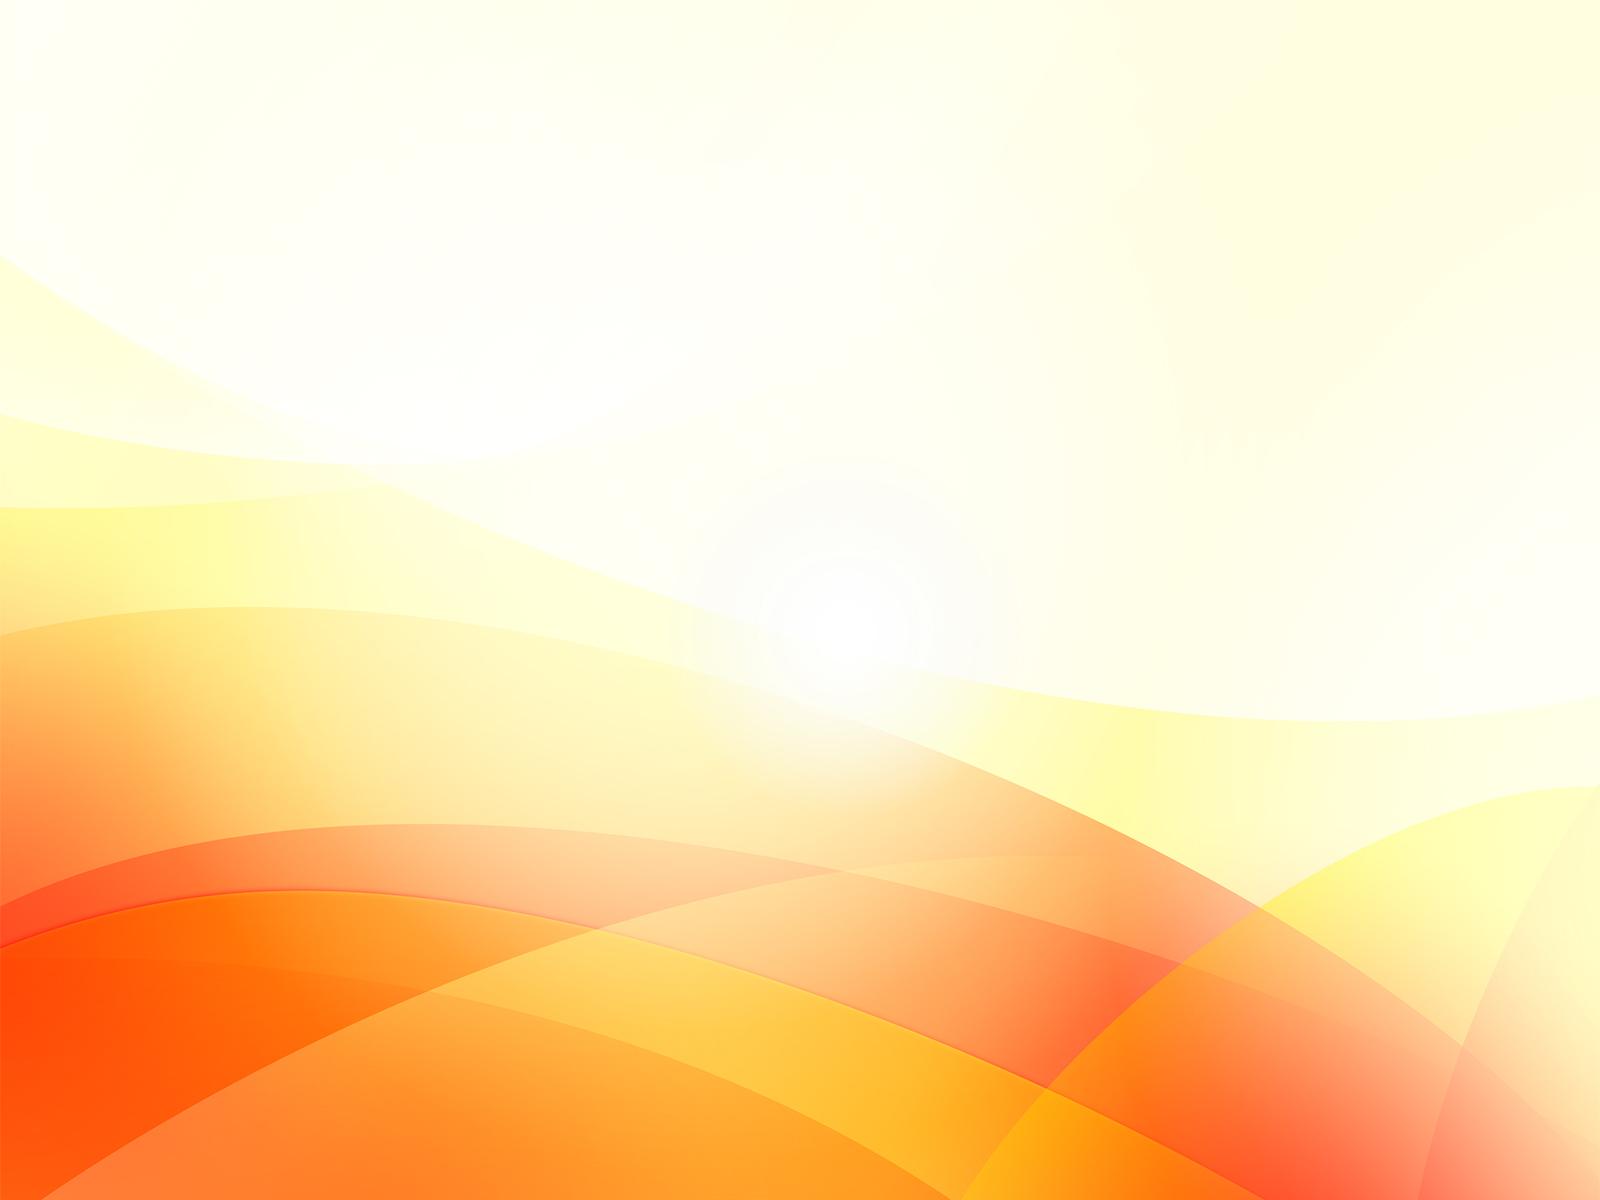 Orange waves ppt backgrounds abstract orange white templates orange waves powerpoint templates toneelgroepblik Gallery